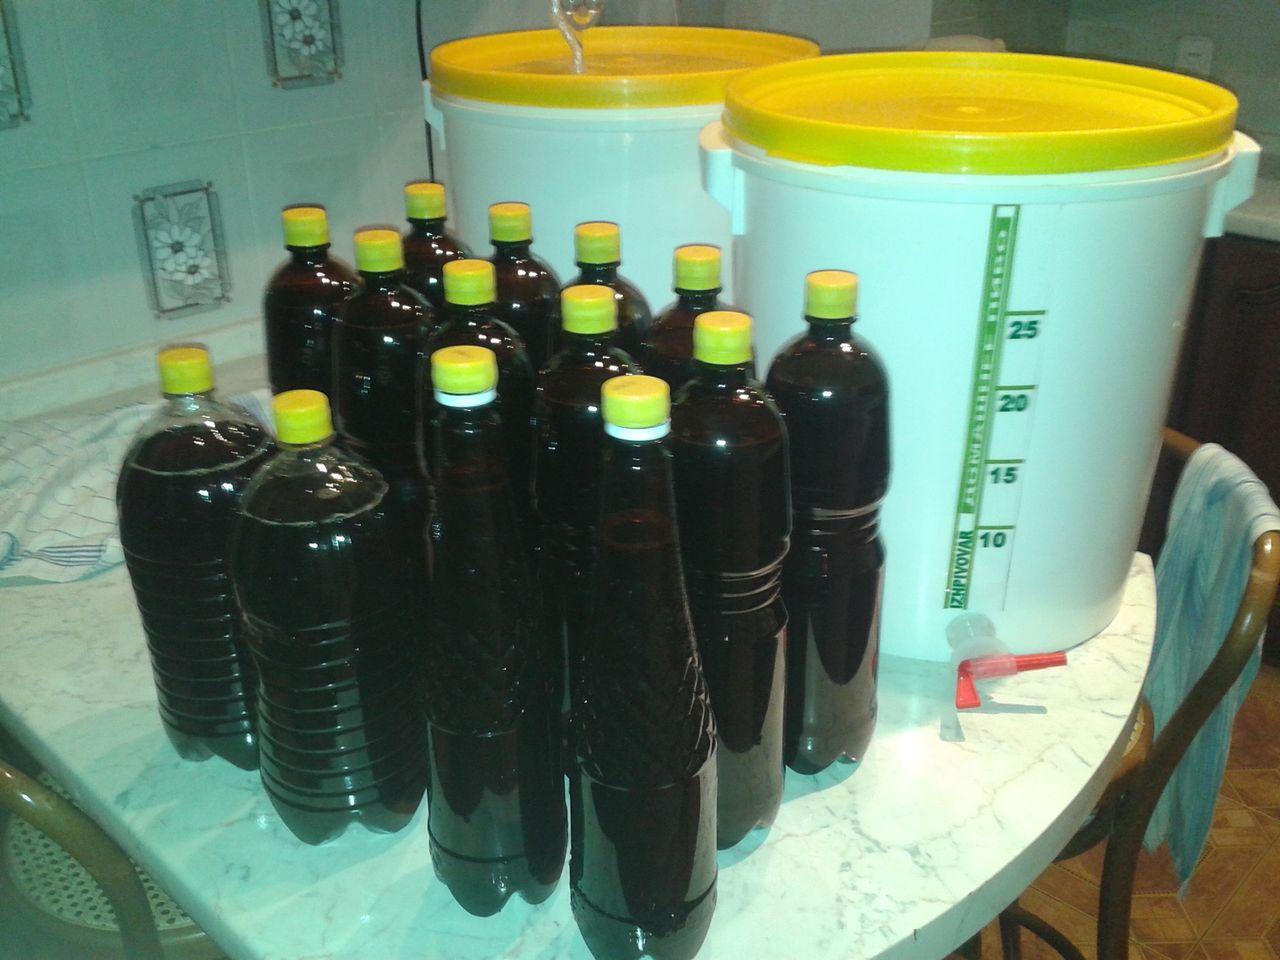 Домашнее пиво своими руками - Домашняя миниПИВОварня ! : Домашнее хозяйство